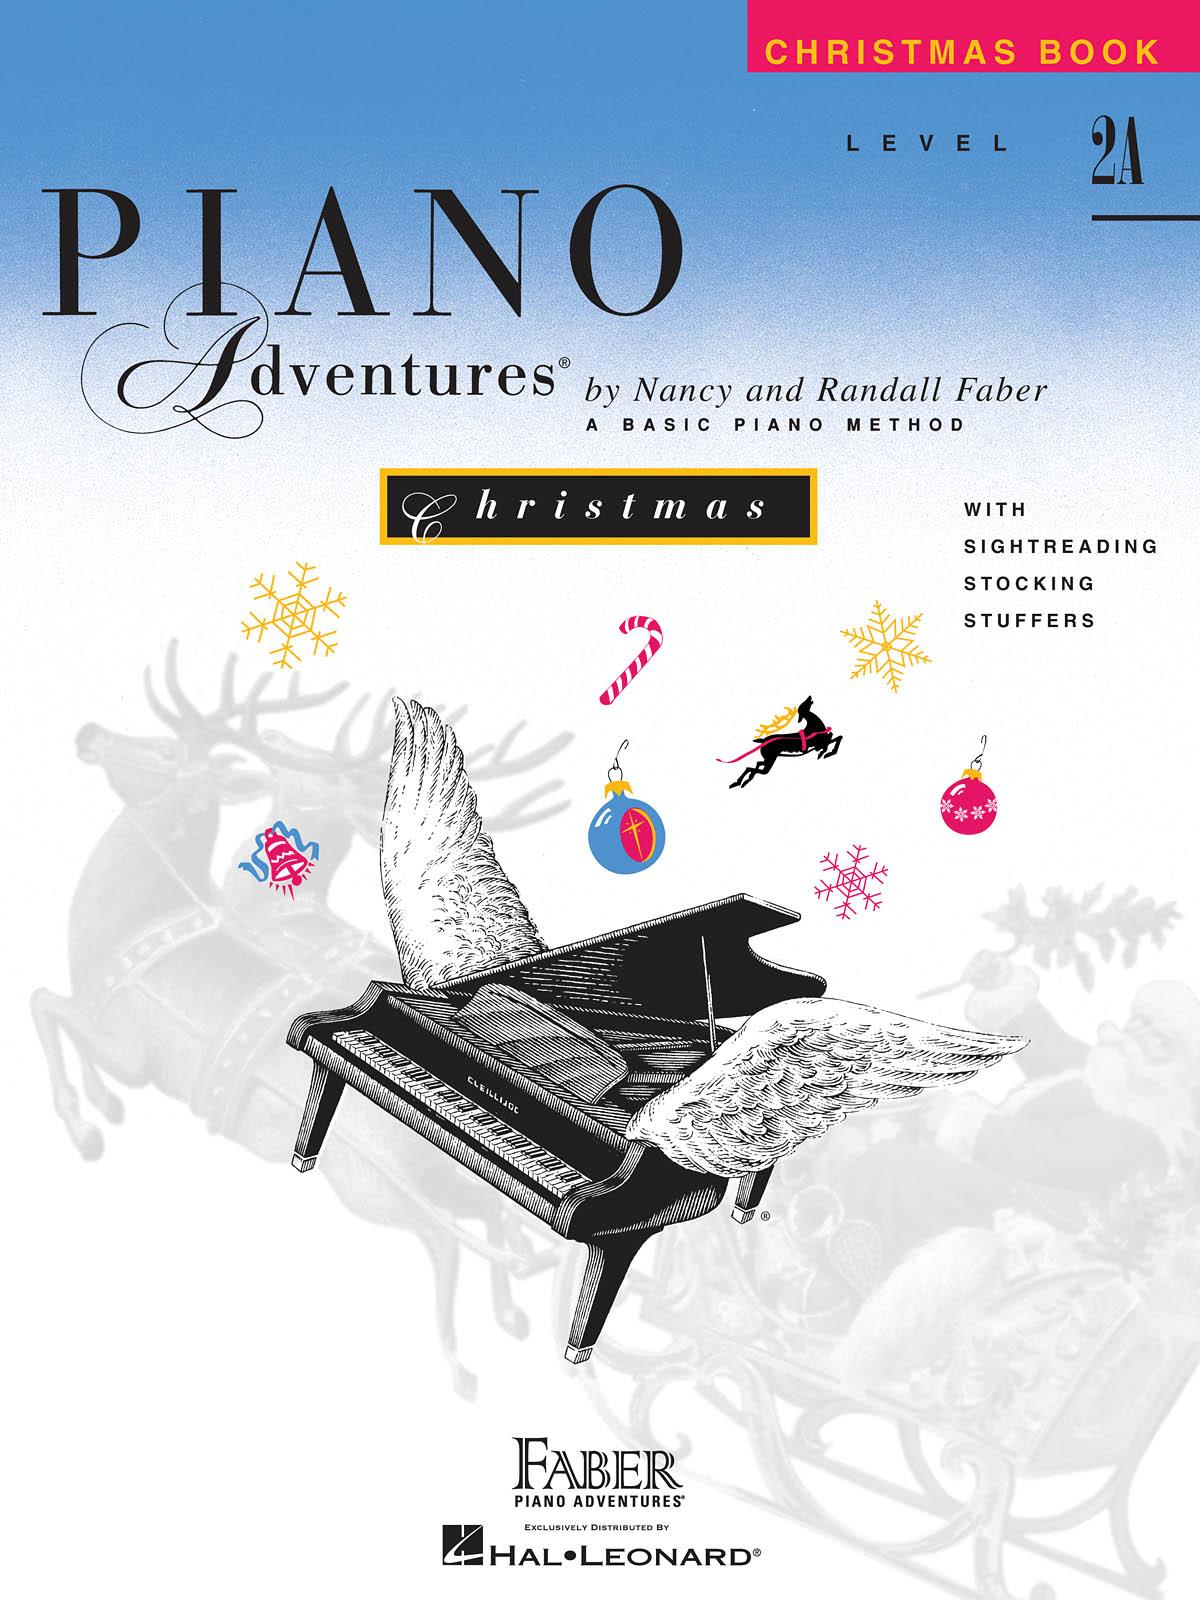 Faber Piano Adventures, Christmas Book, Level 2A